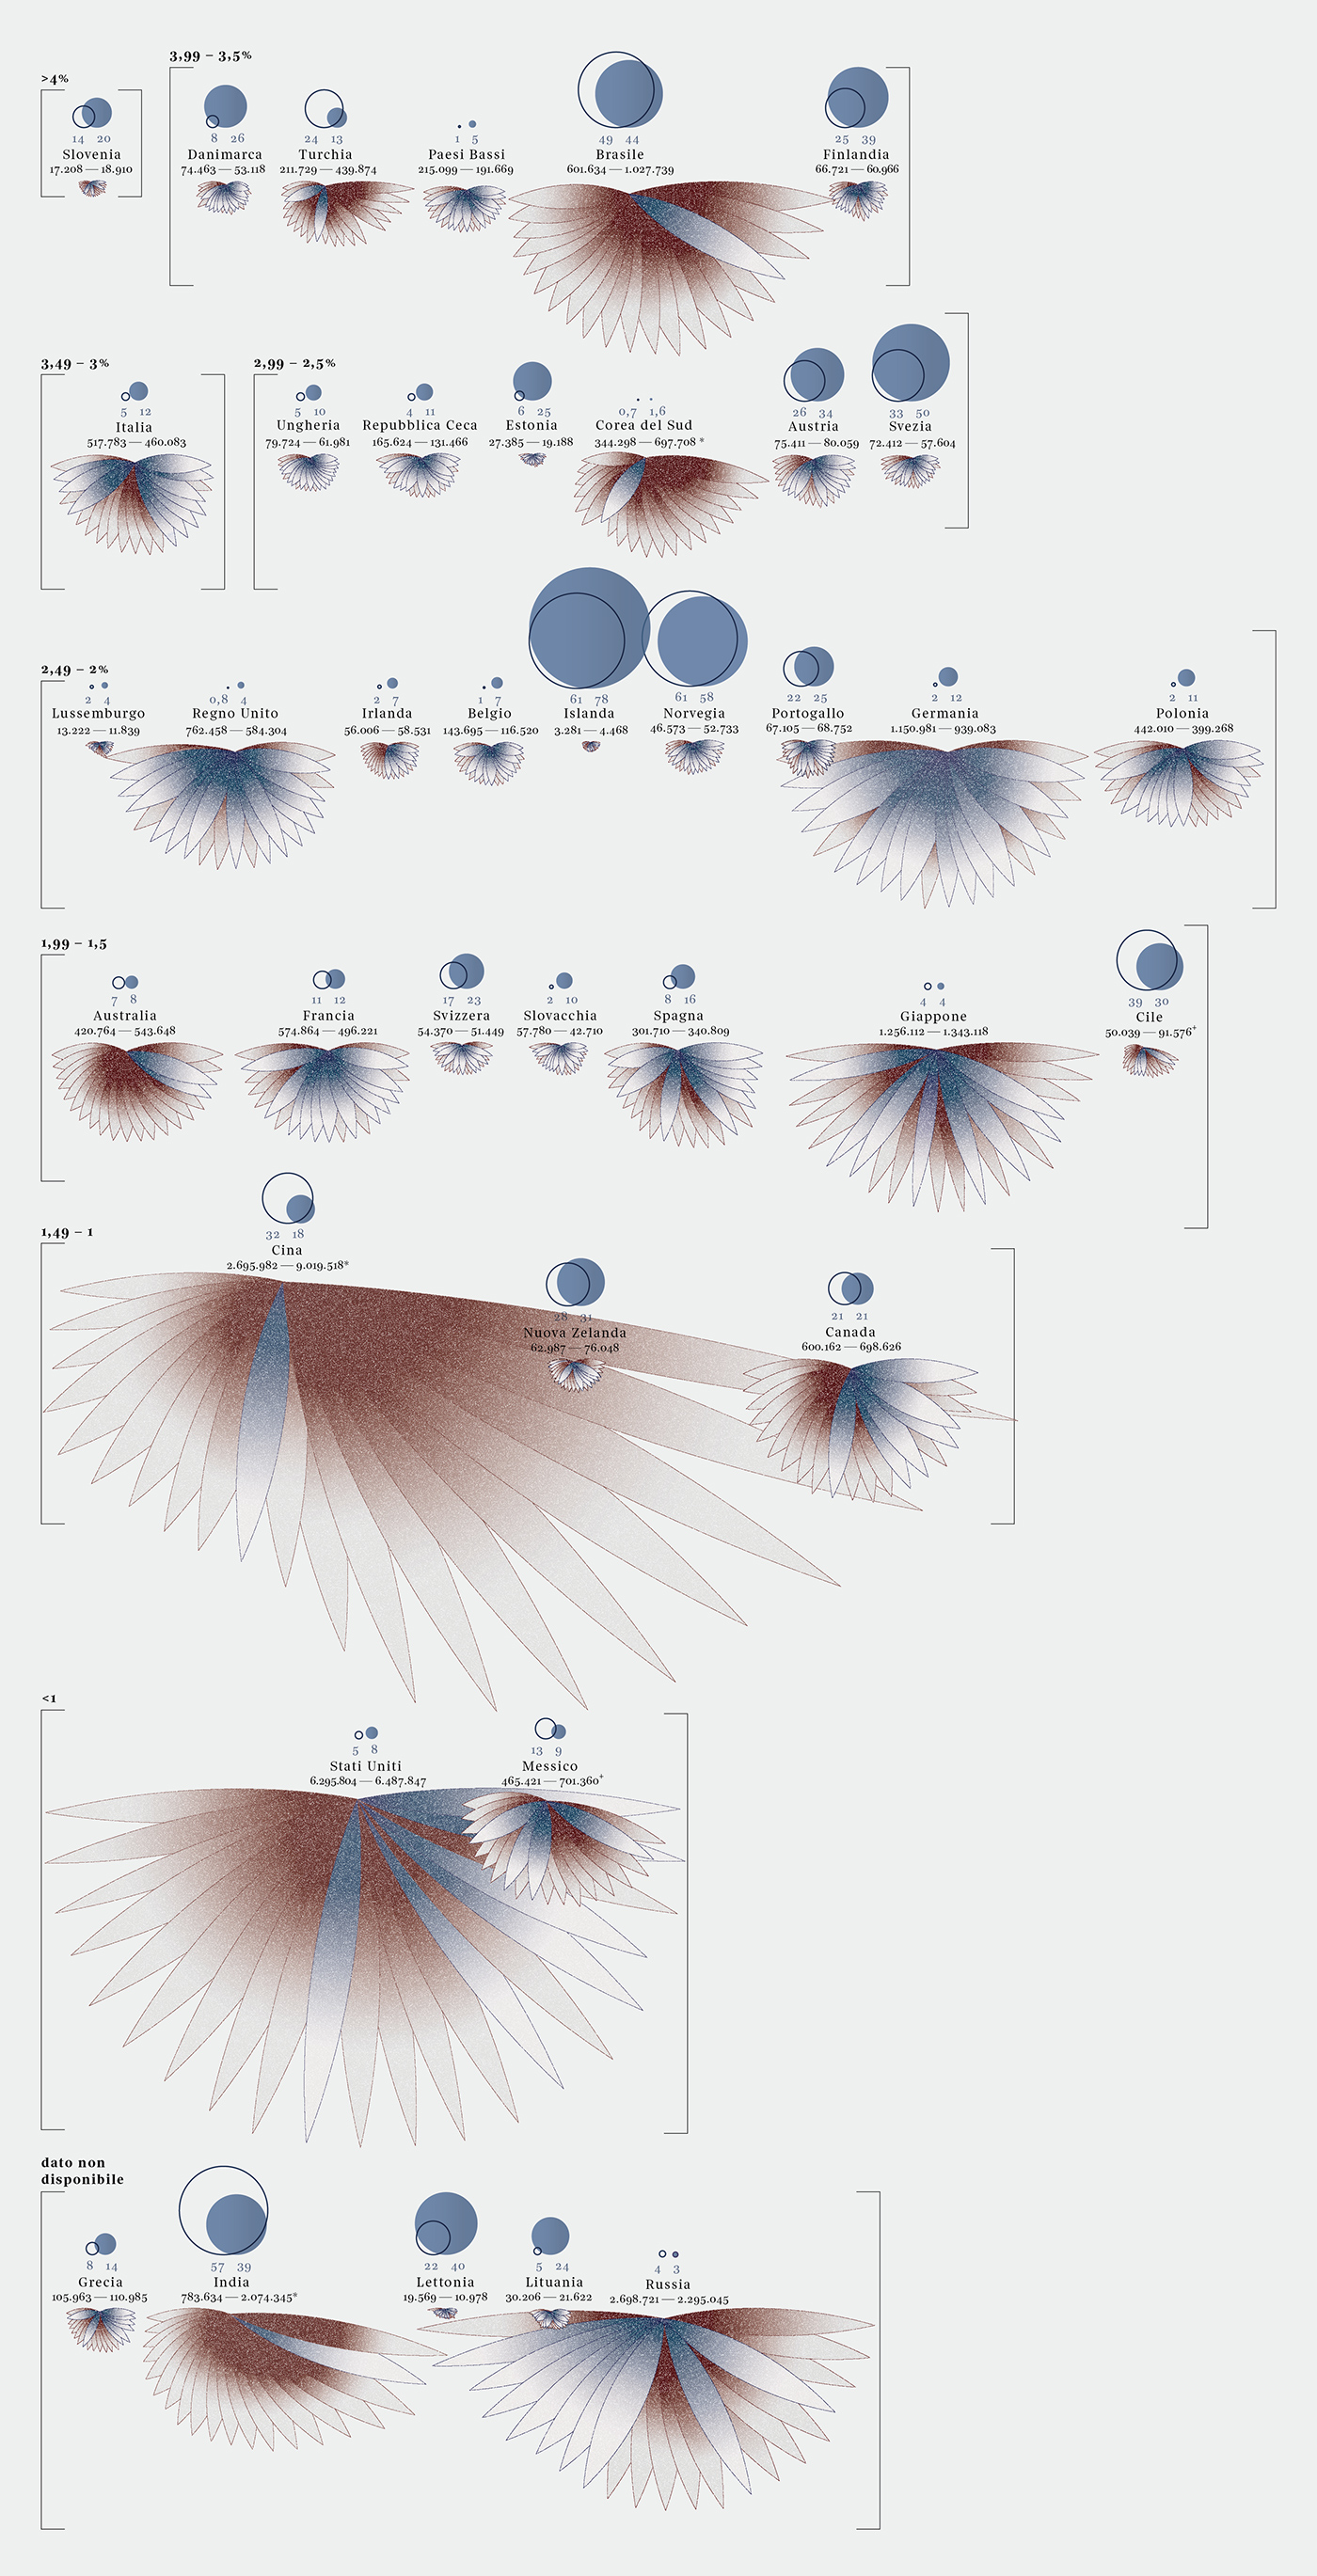 CO2 emissions DATAVISUALIZATION Data visualization dataviz information informationdesign